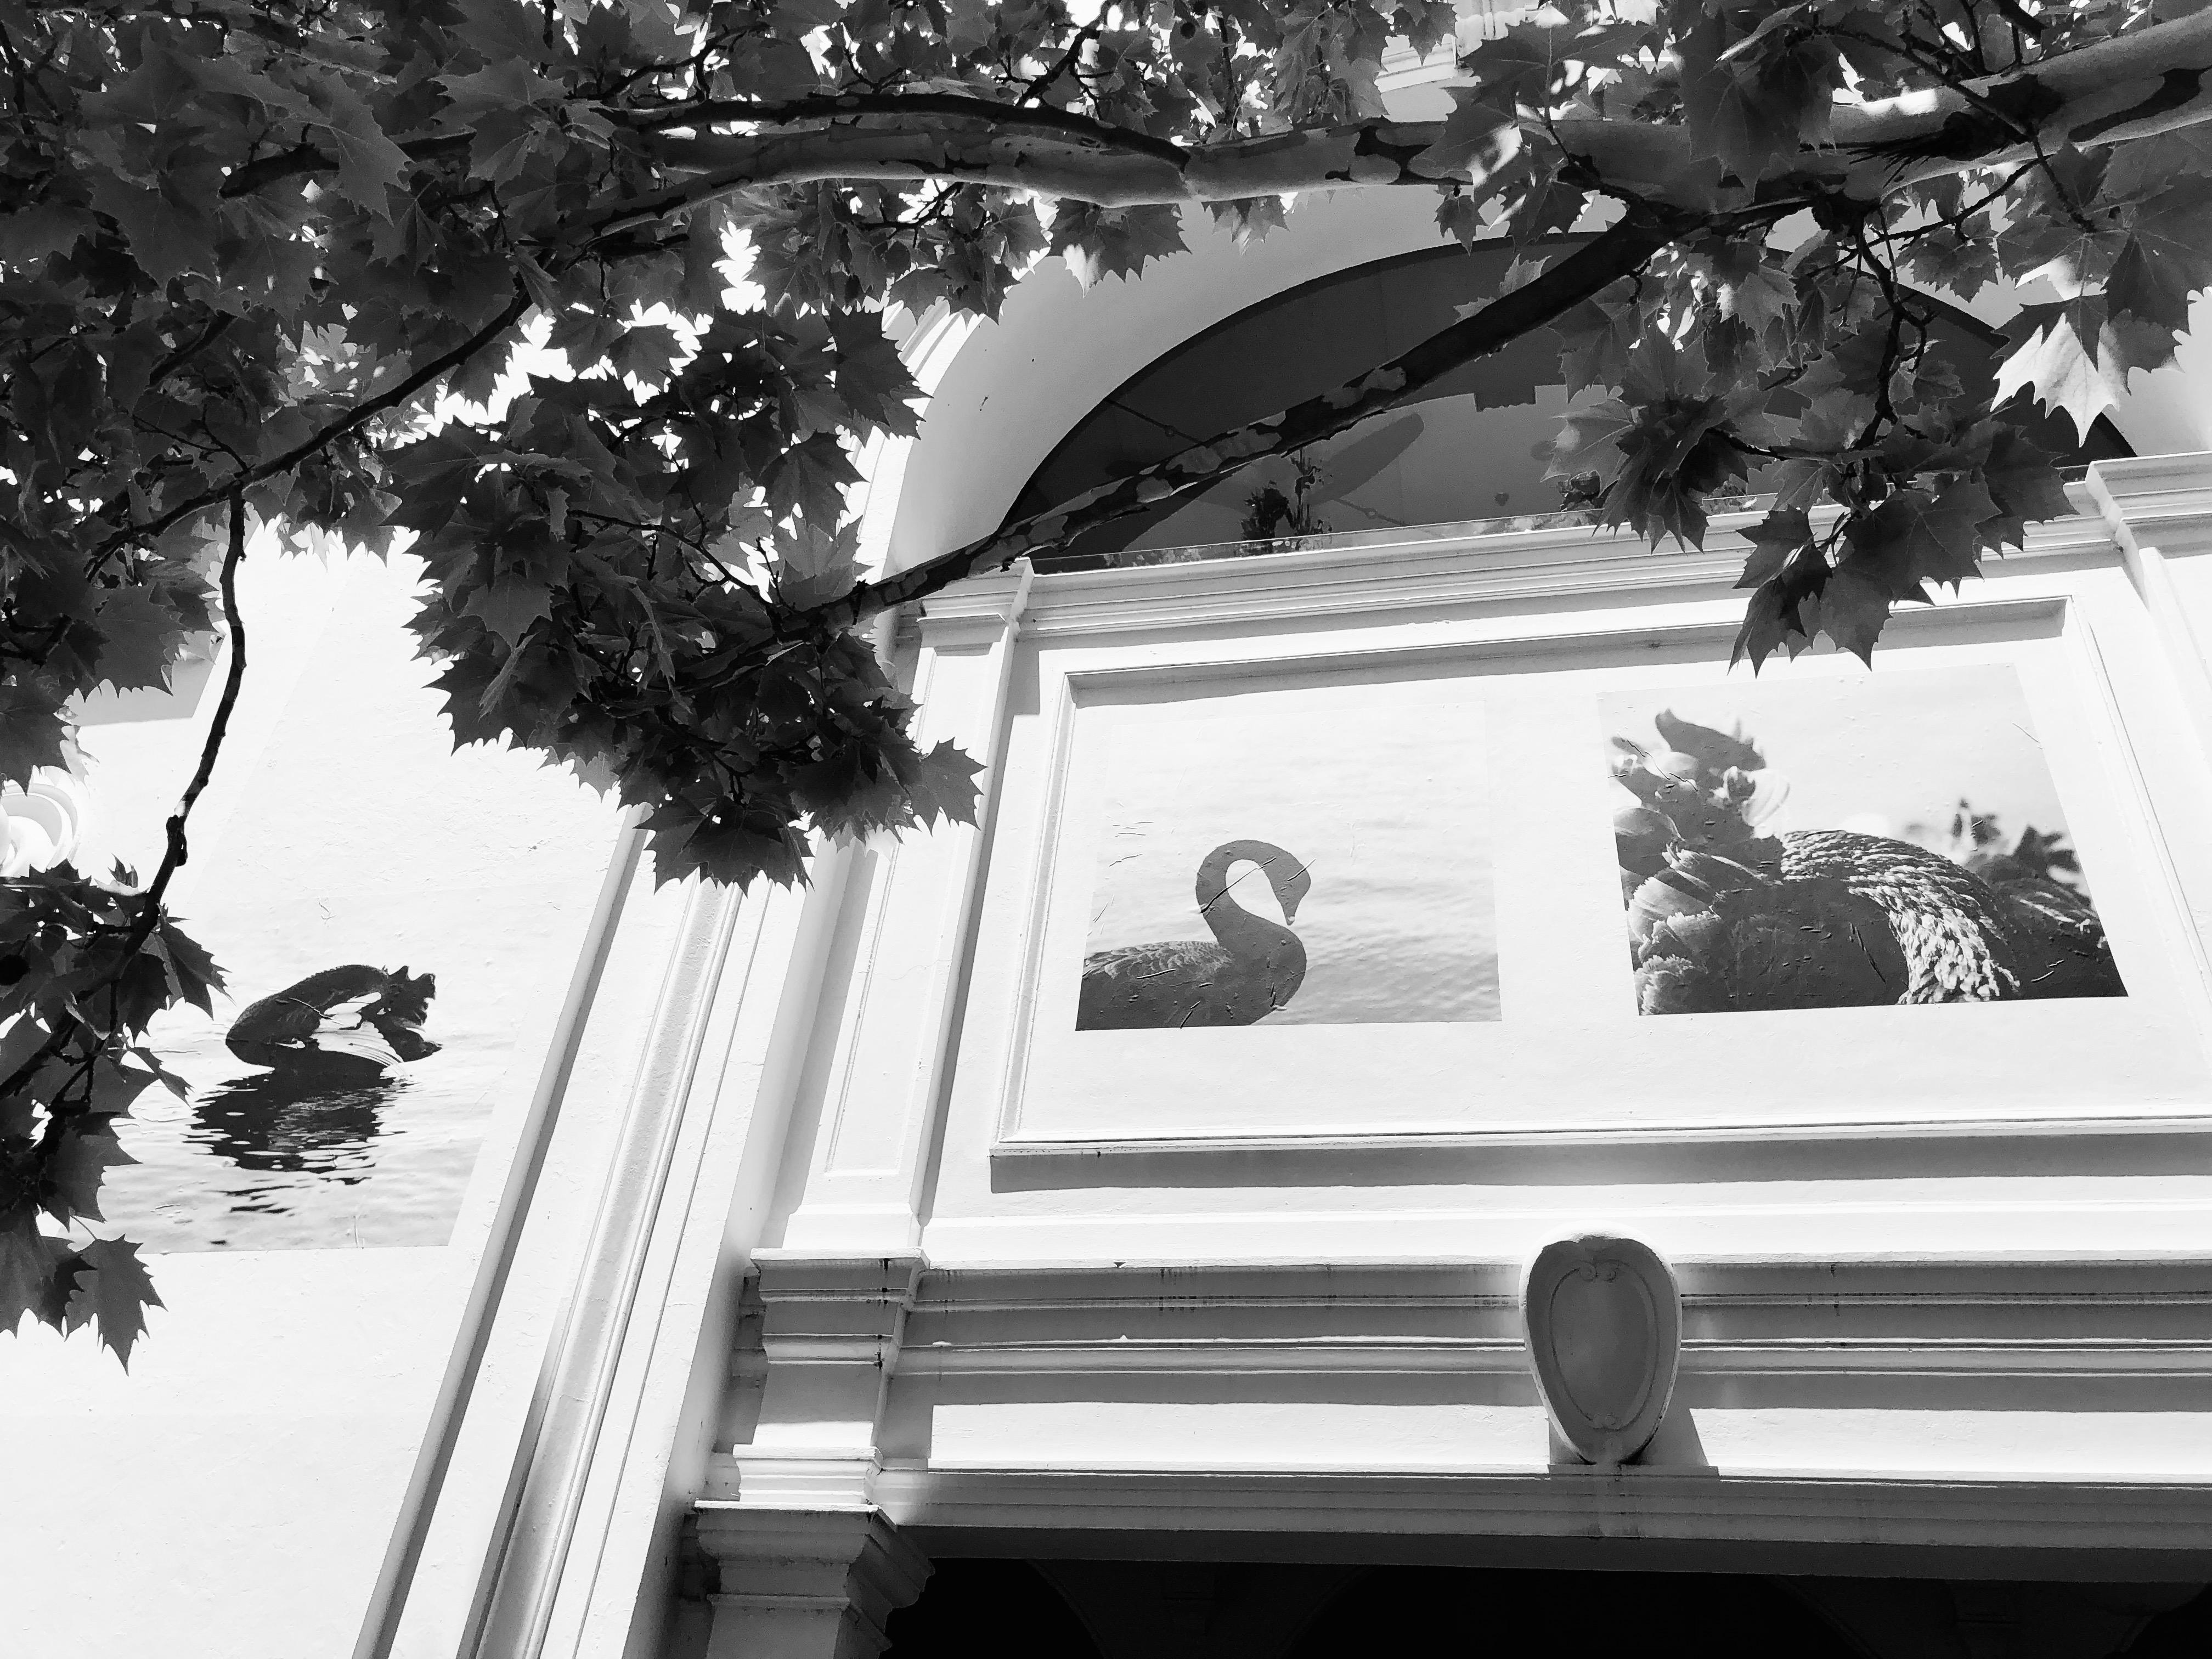 cygnus atratus photographic exhibition, melbourne building